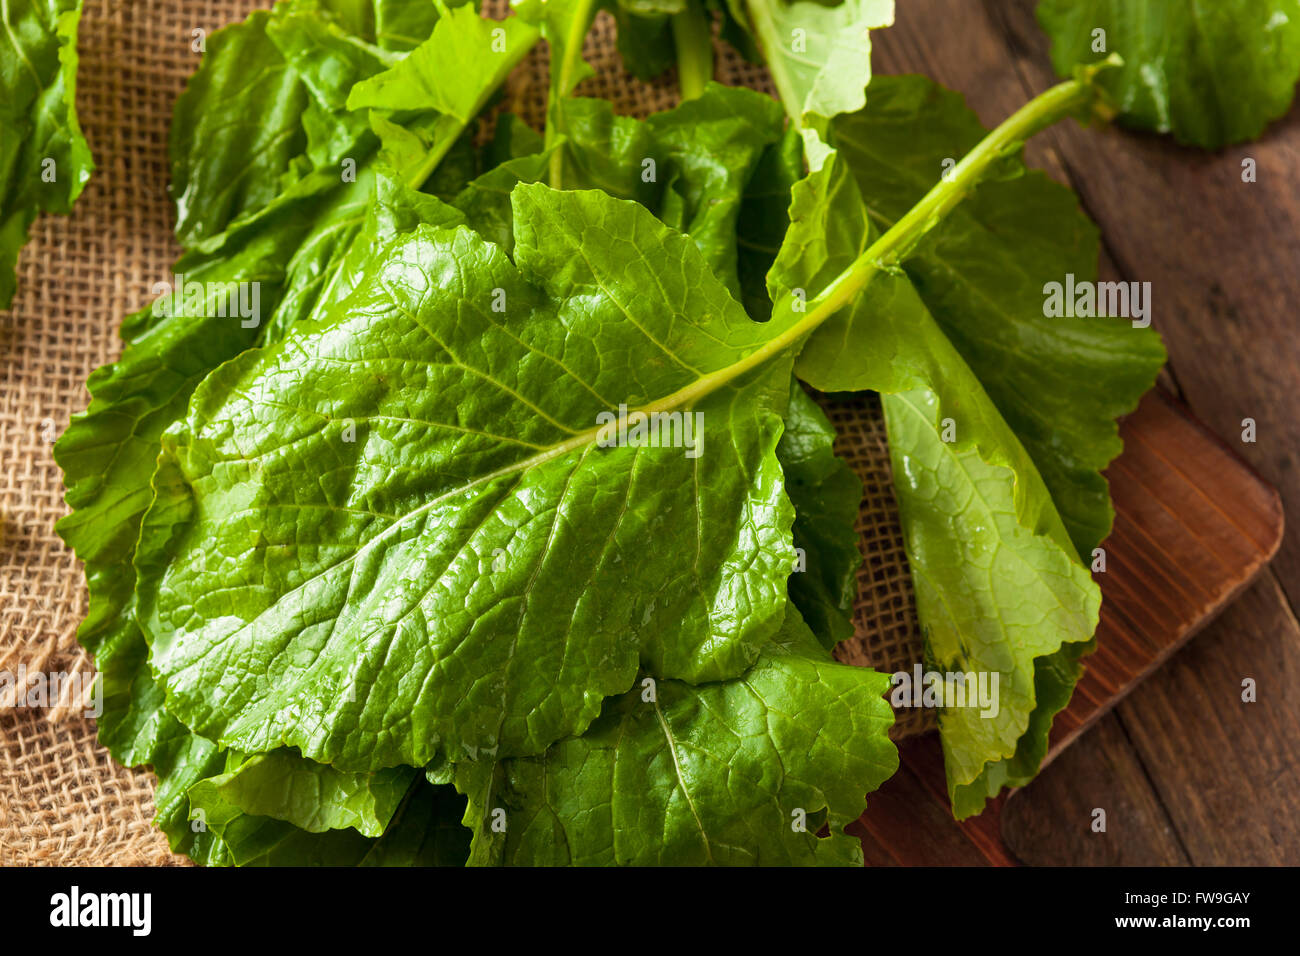 Raw Organic Turnip Greens Ready to Eat - Stock Image